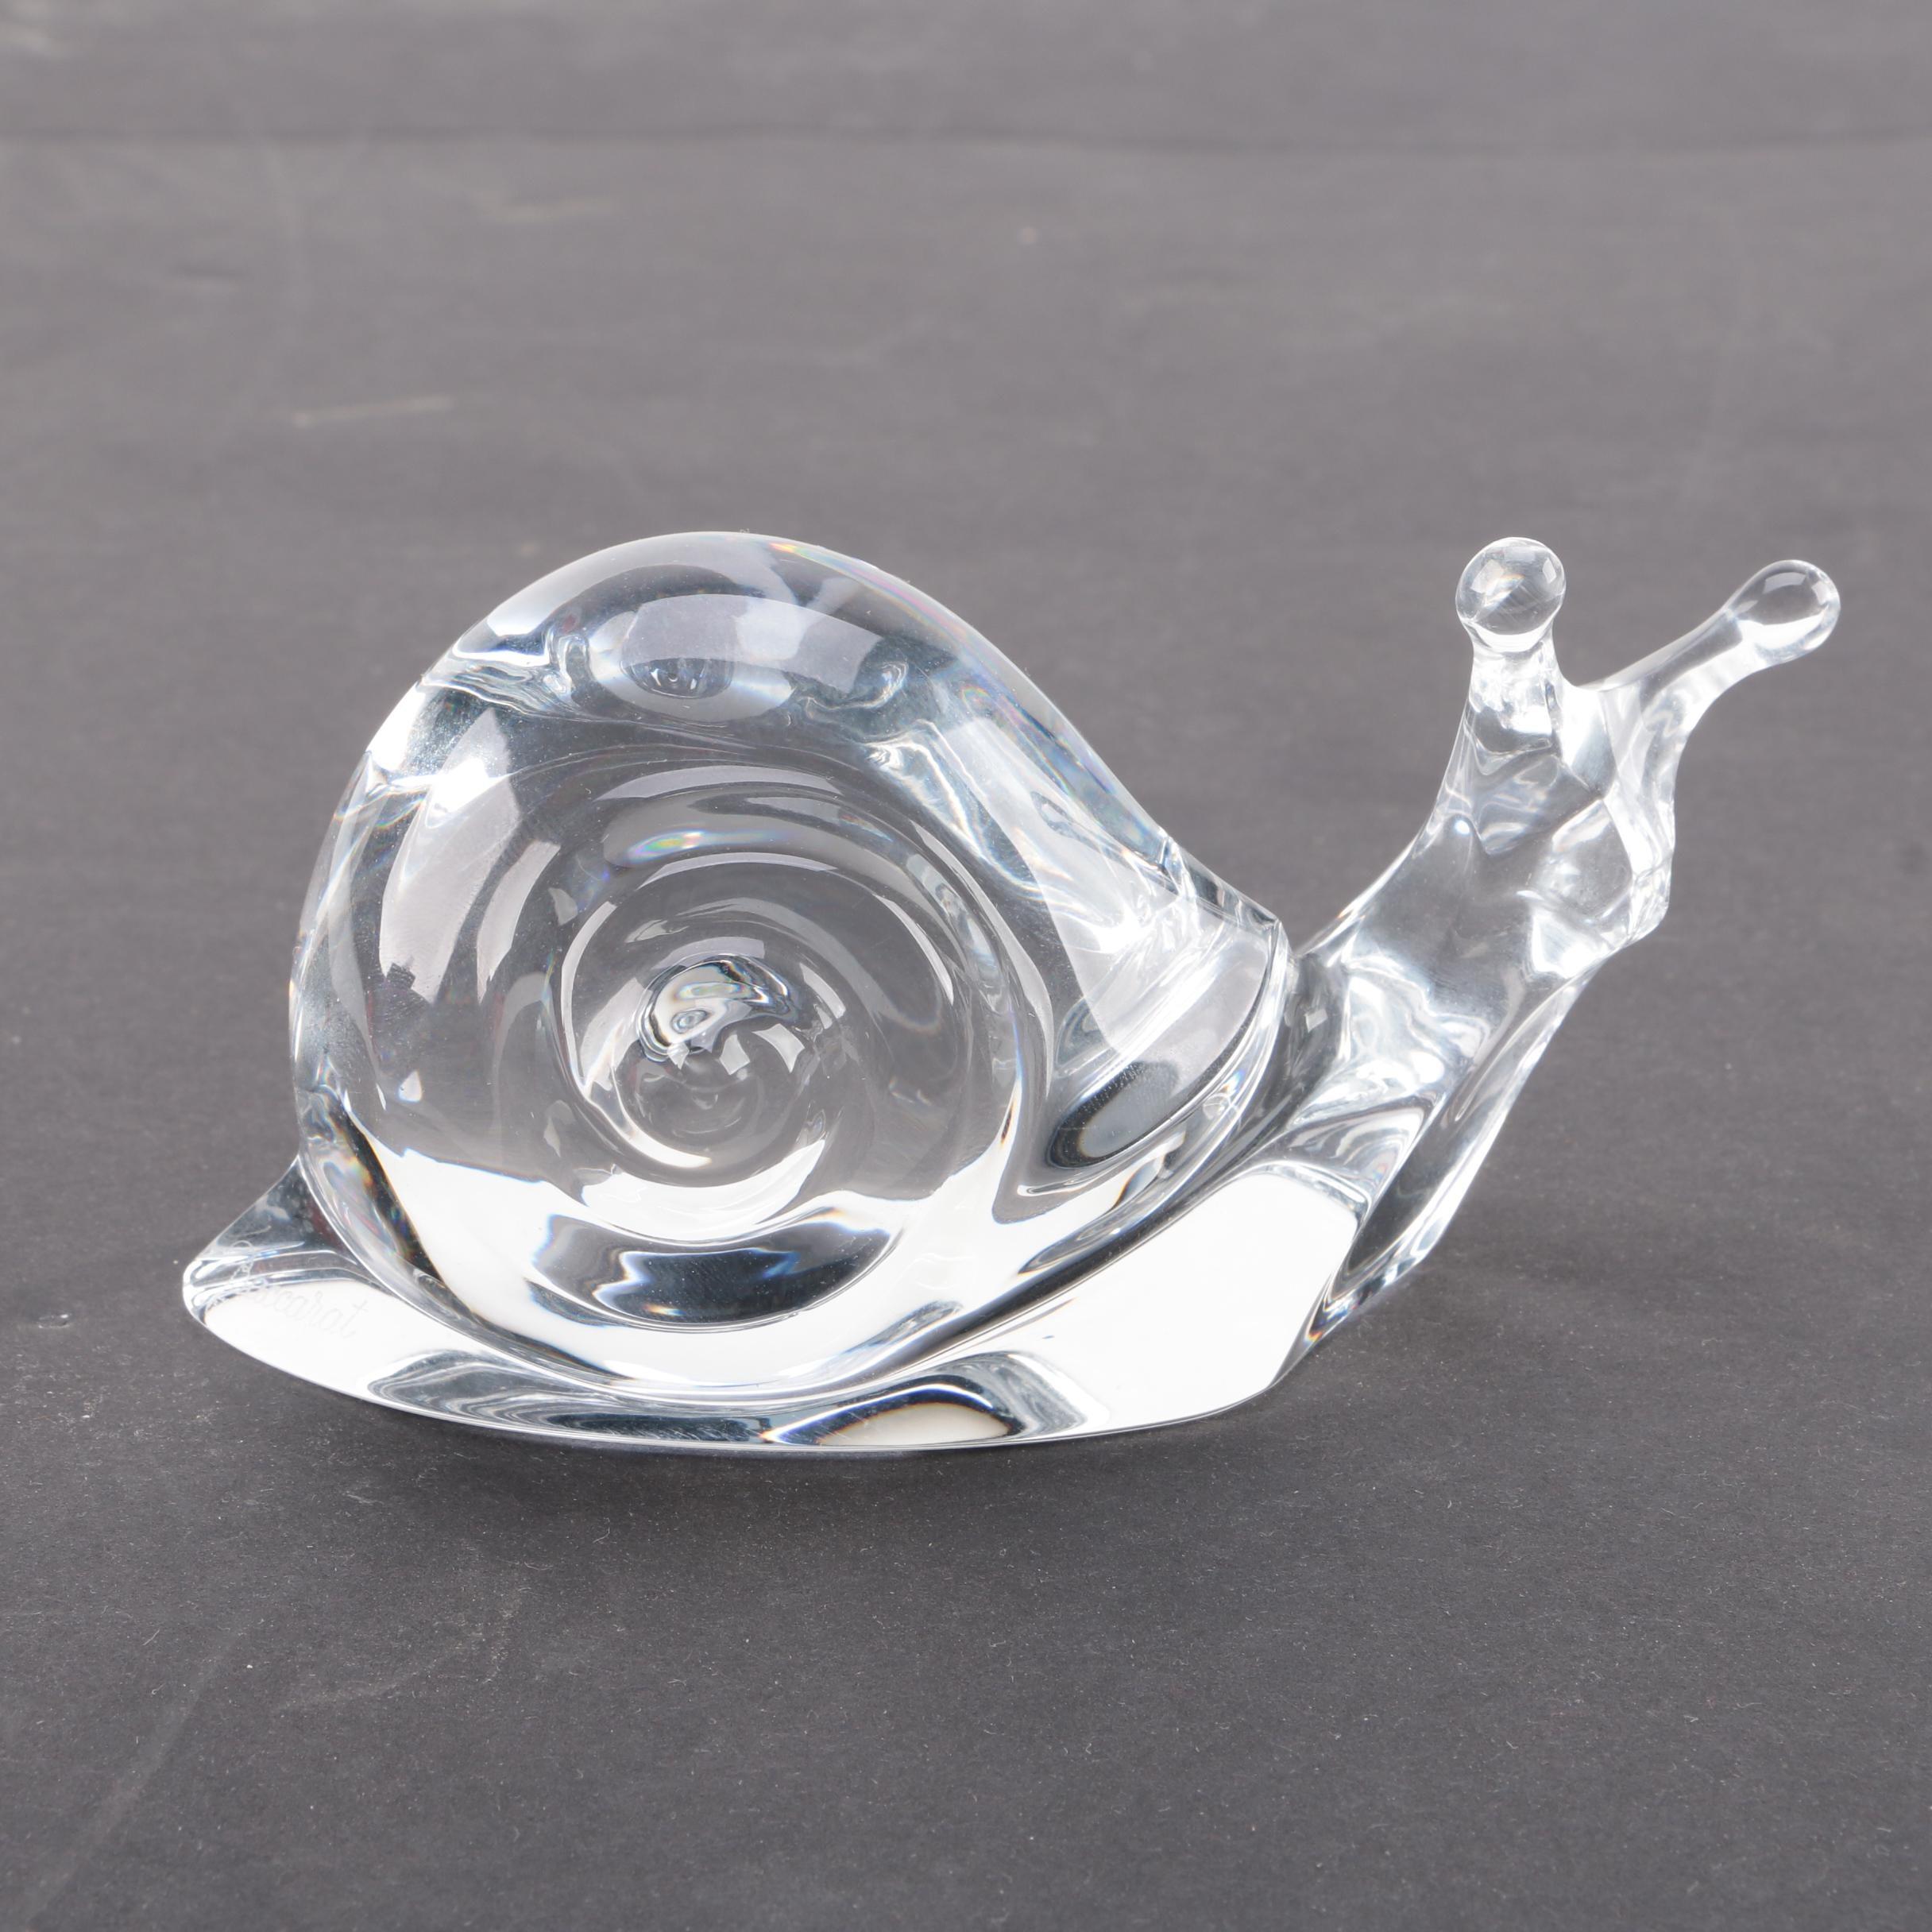 Baccarat Crystal Snail Figurine